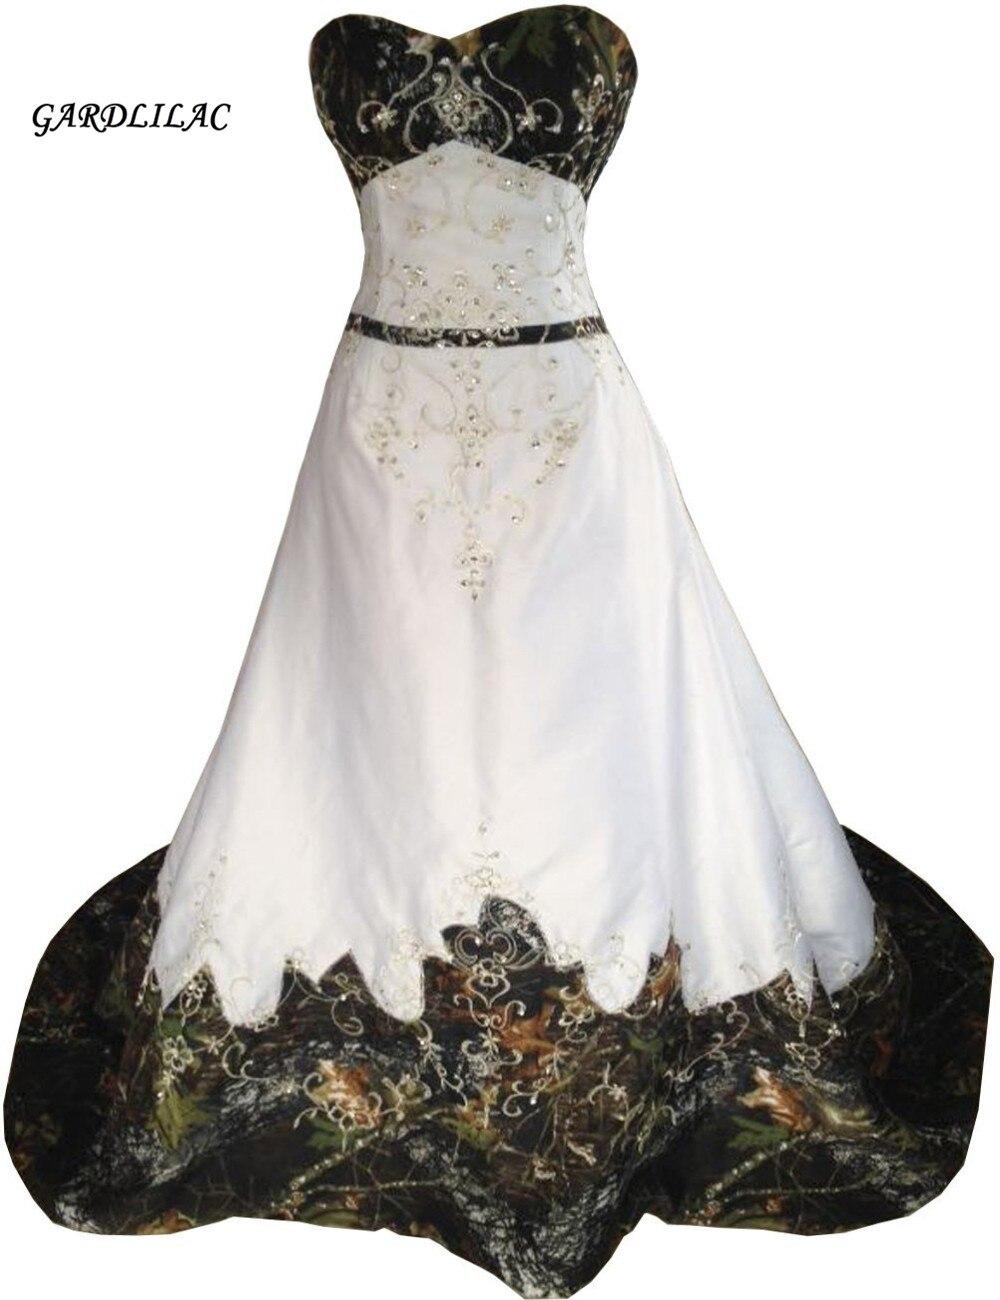 White Camouflage Alinewedding Dresses 2019 Hot Sale Inexpensive